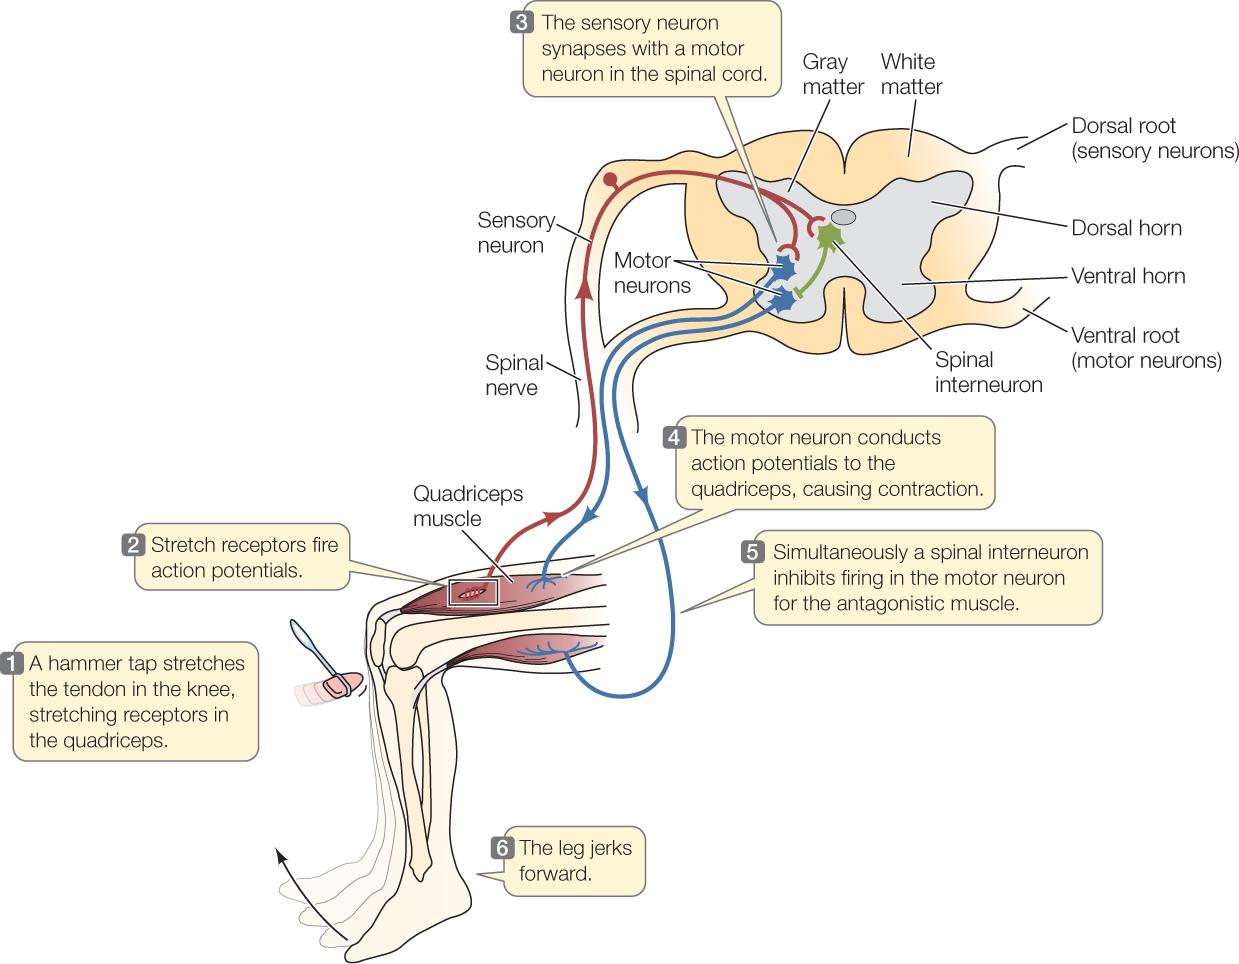 Motor Neuron And Sensory Neuron Diagram